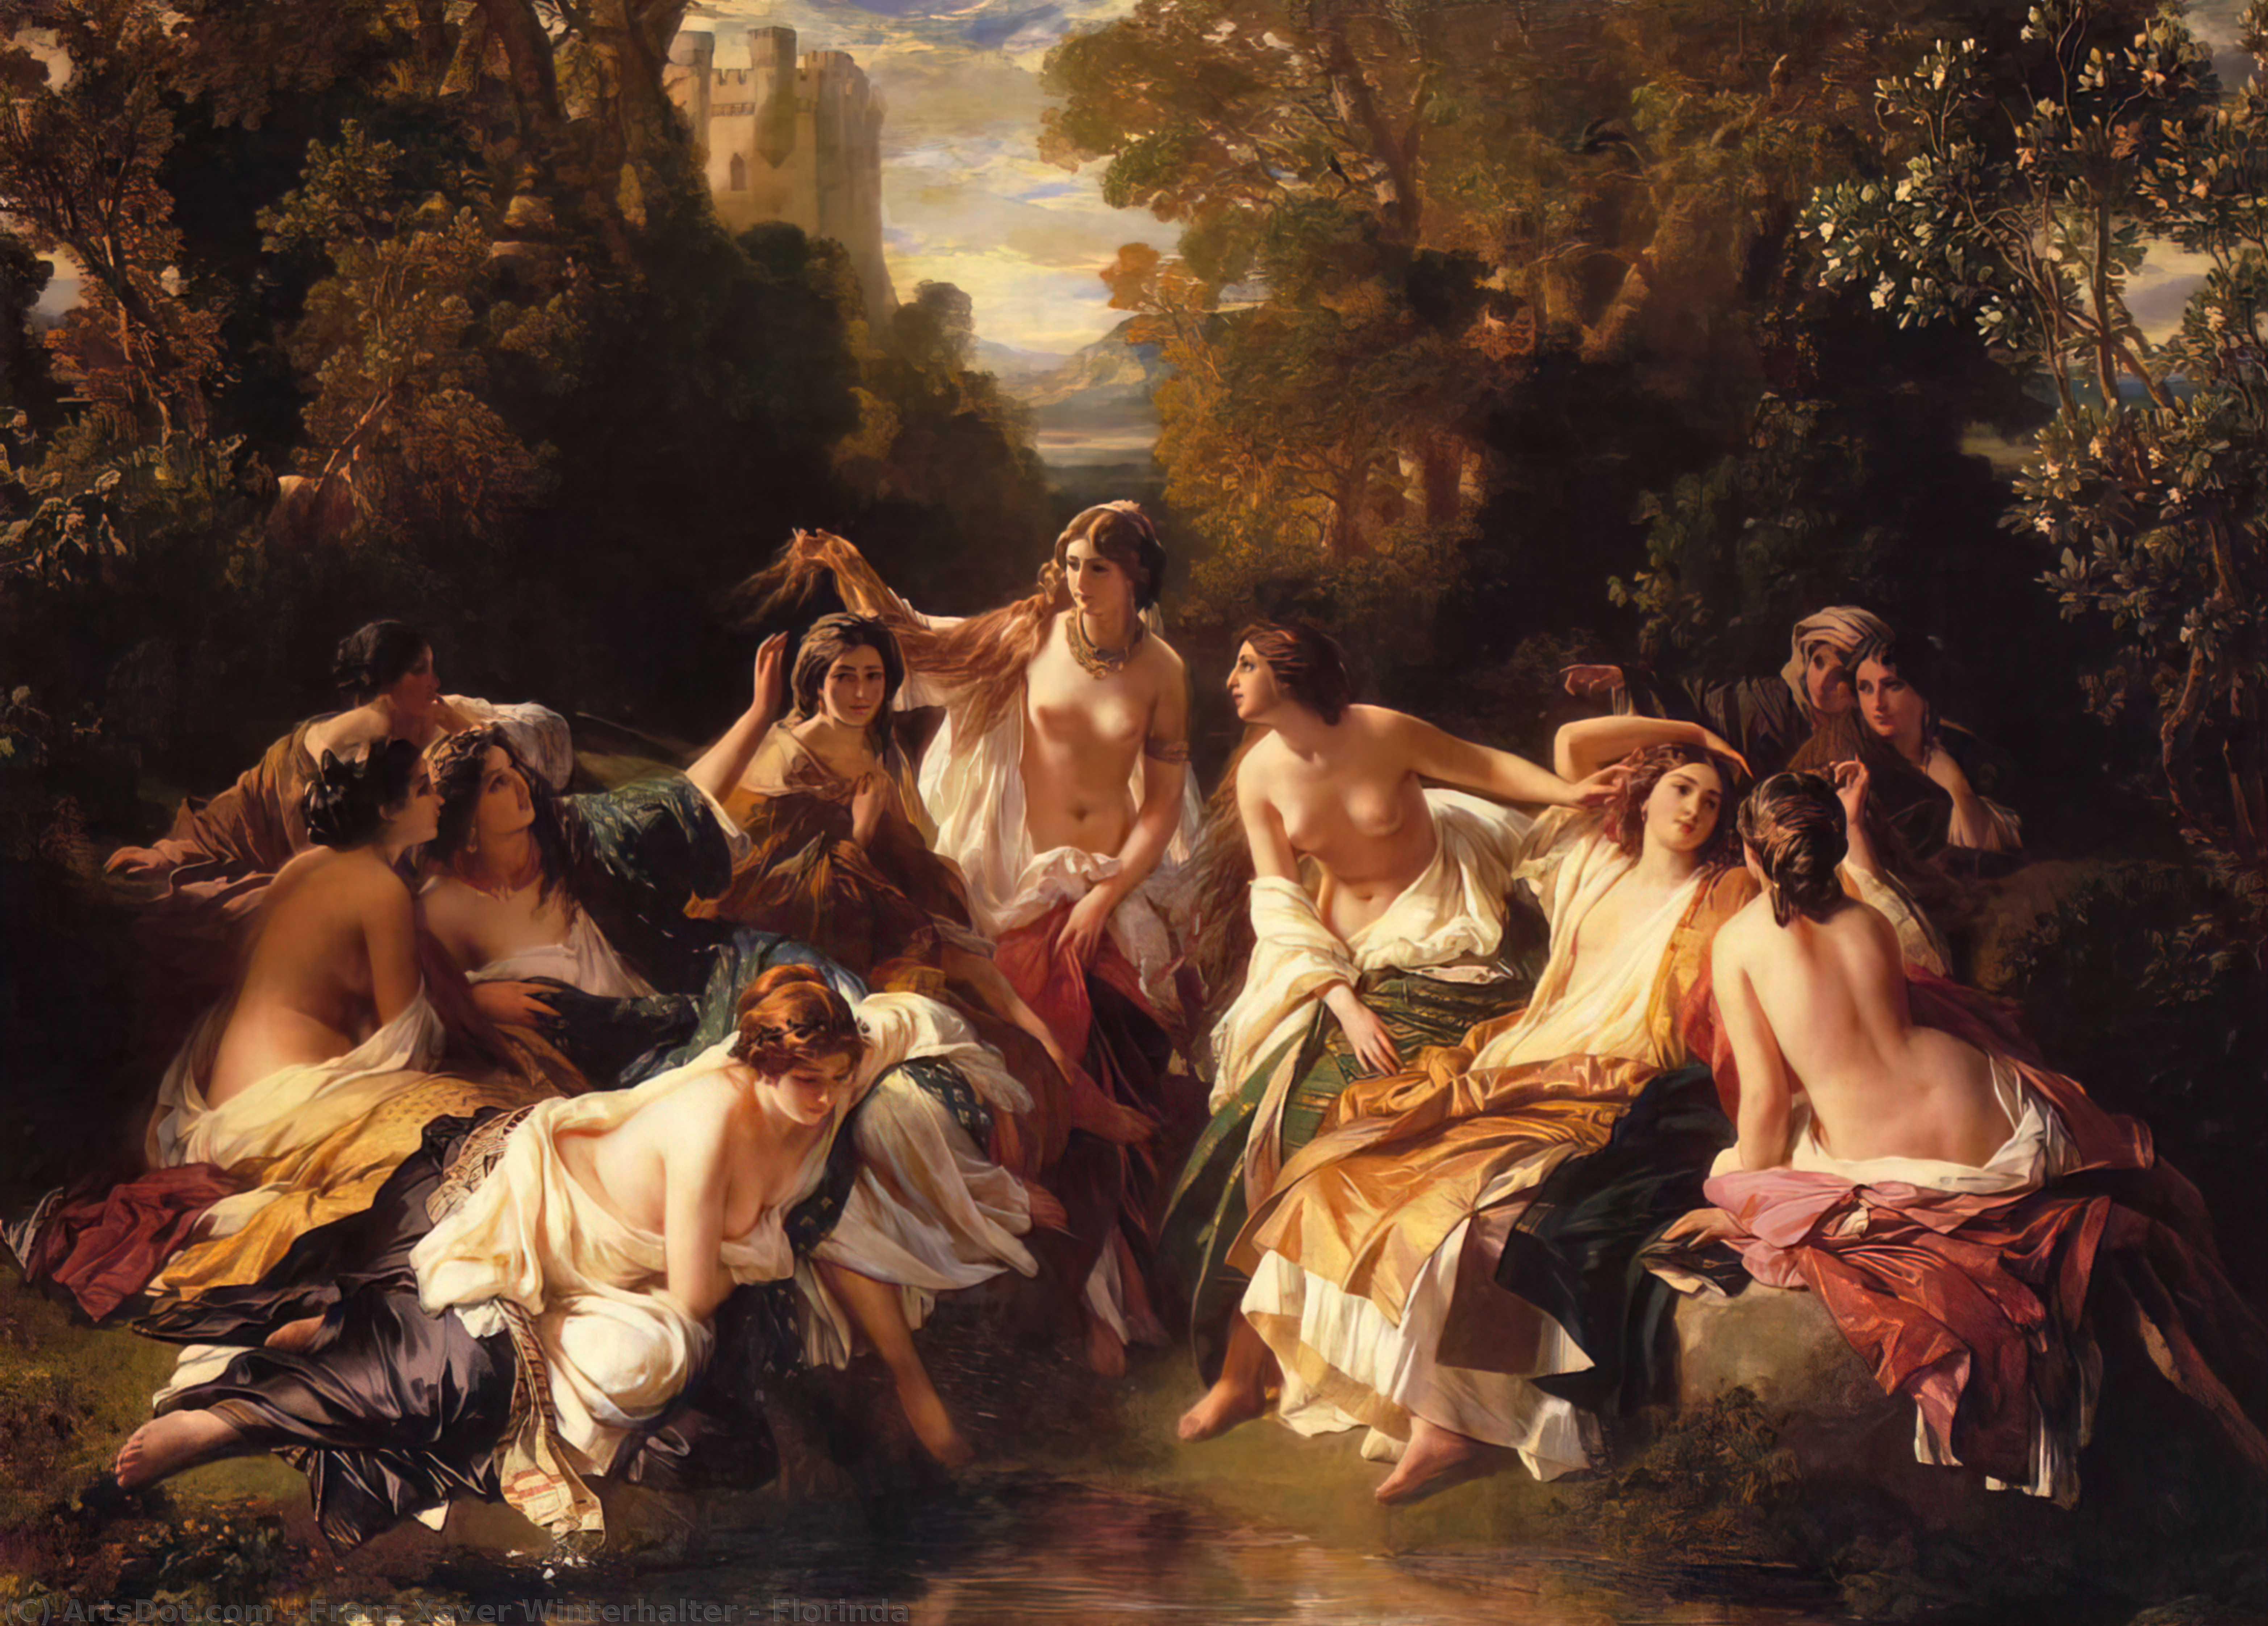 Wikioo.org - The Encyclopedia of Fine Arts - Painting, Artwork by Franz Xaver Winterhalter - Florinda